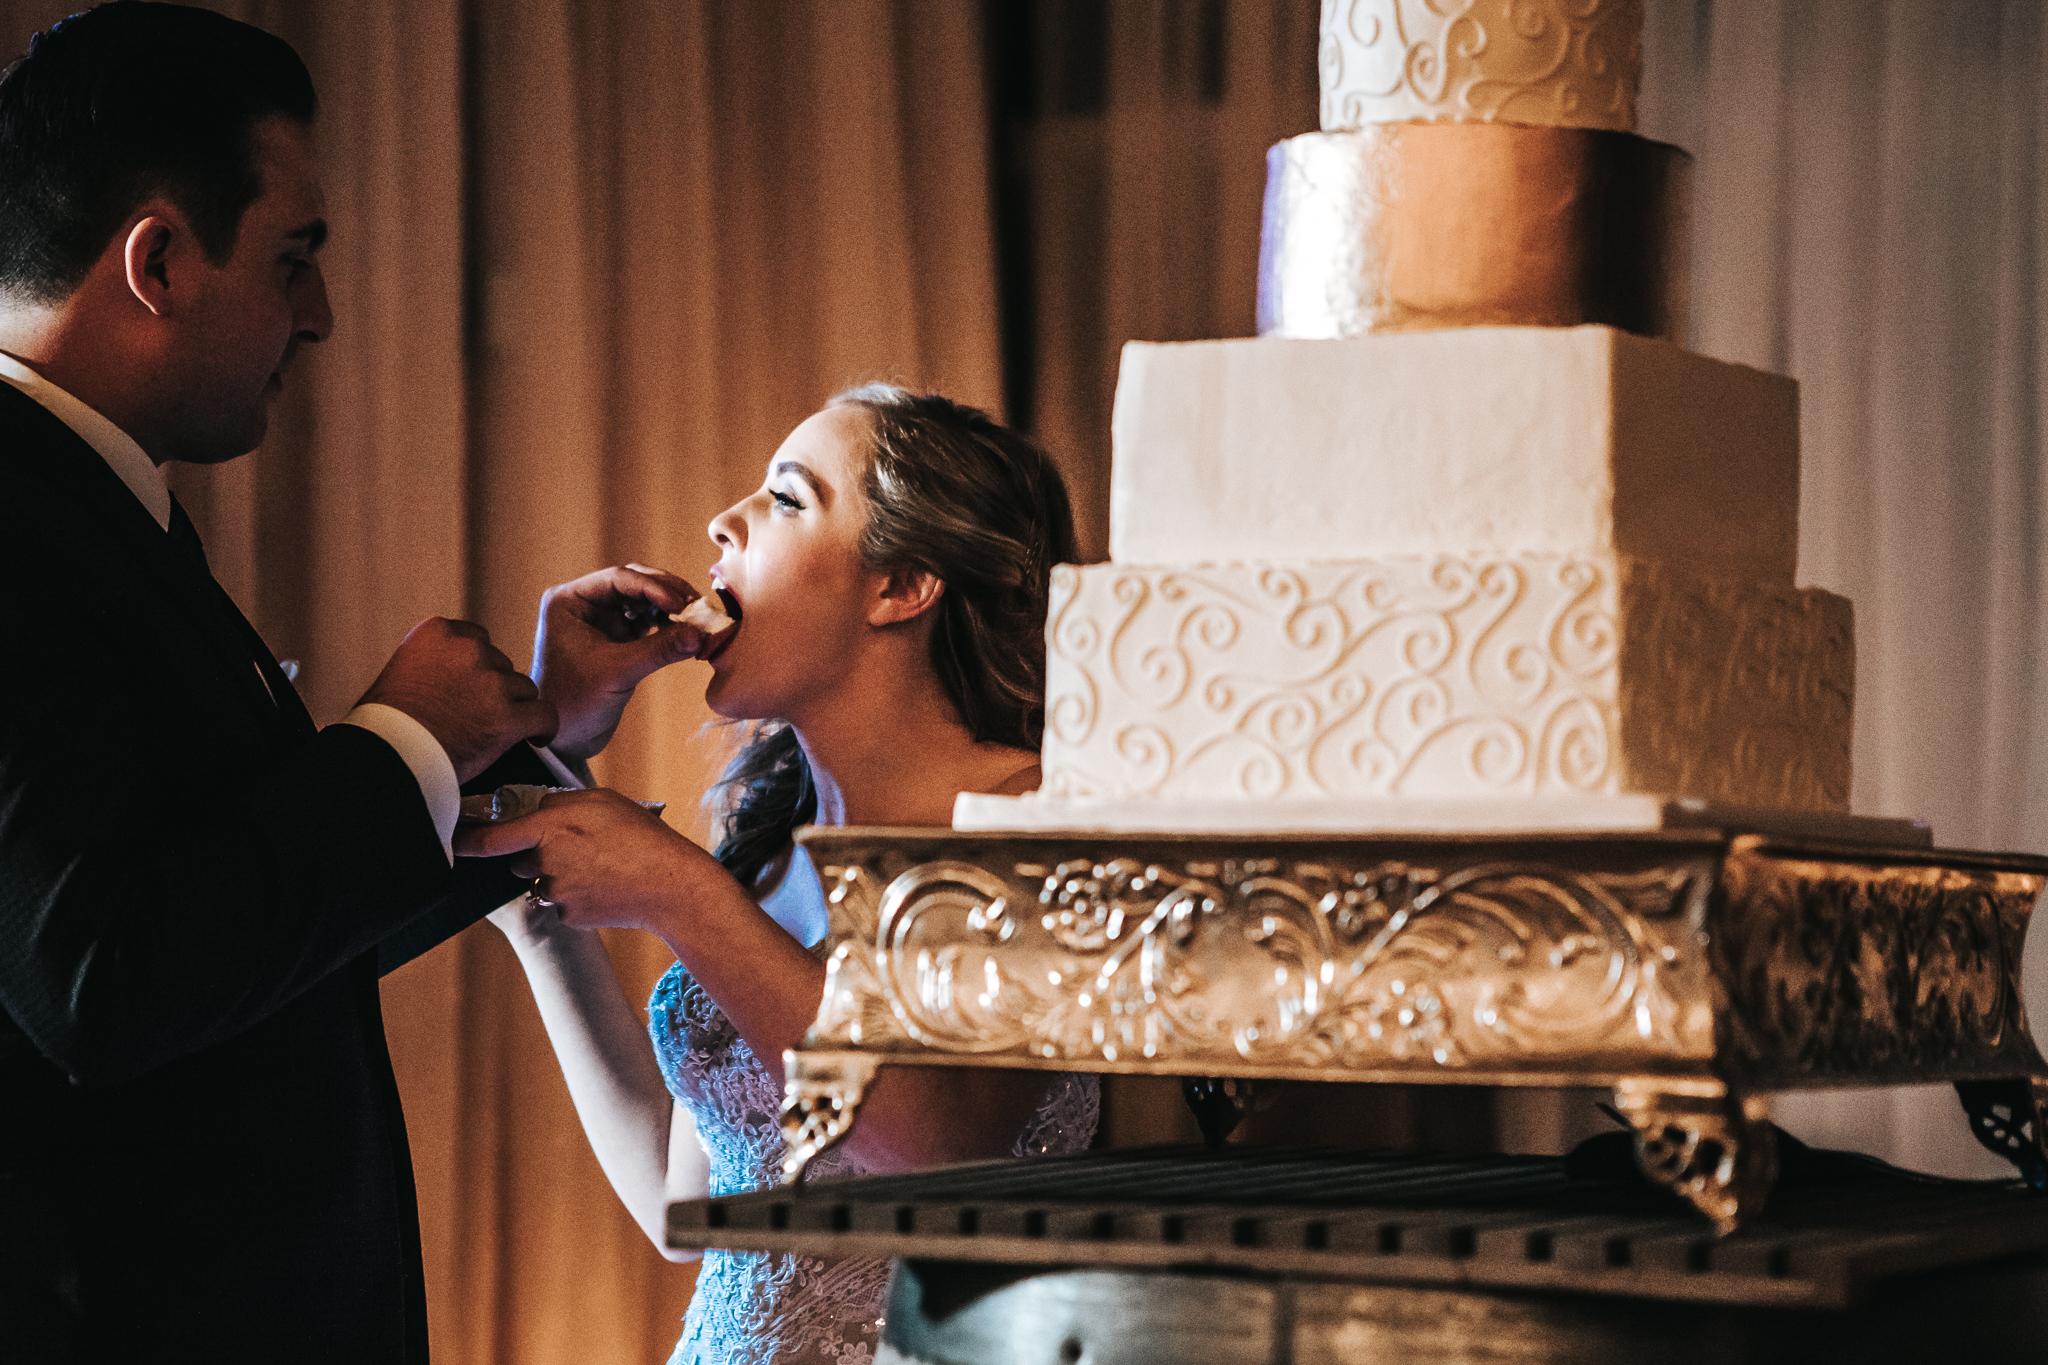 0161 Ariana Jordan Photo - Cameron & Lauren's Wedding at Talon Winery  9534.jpg